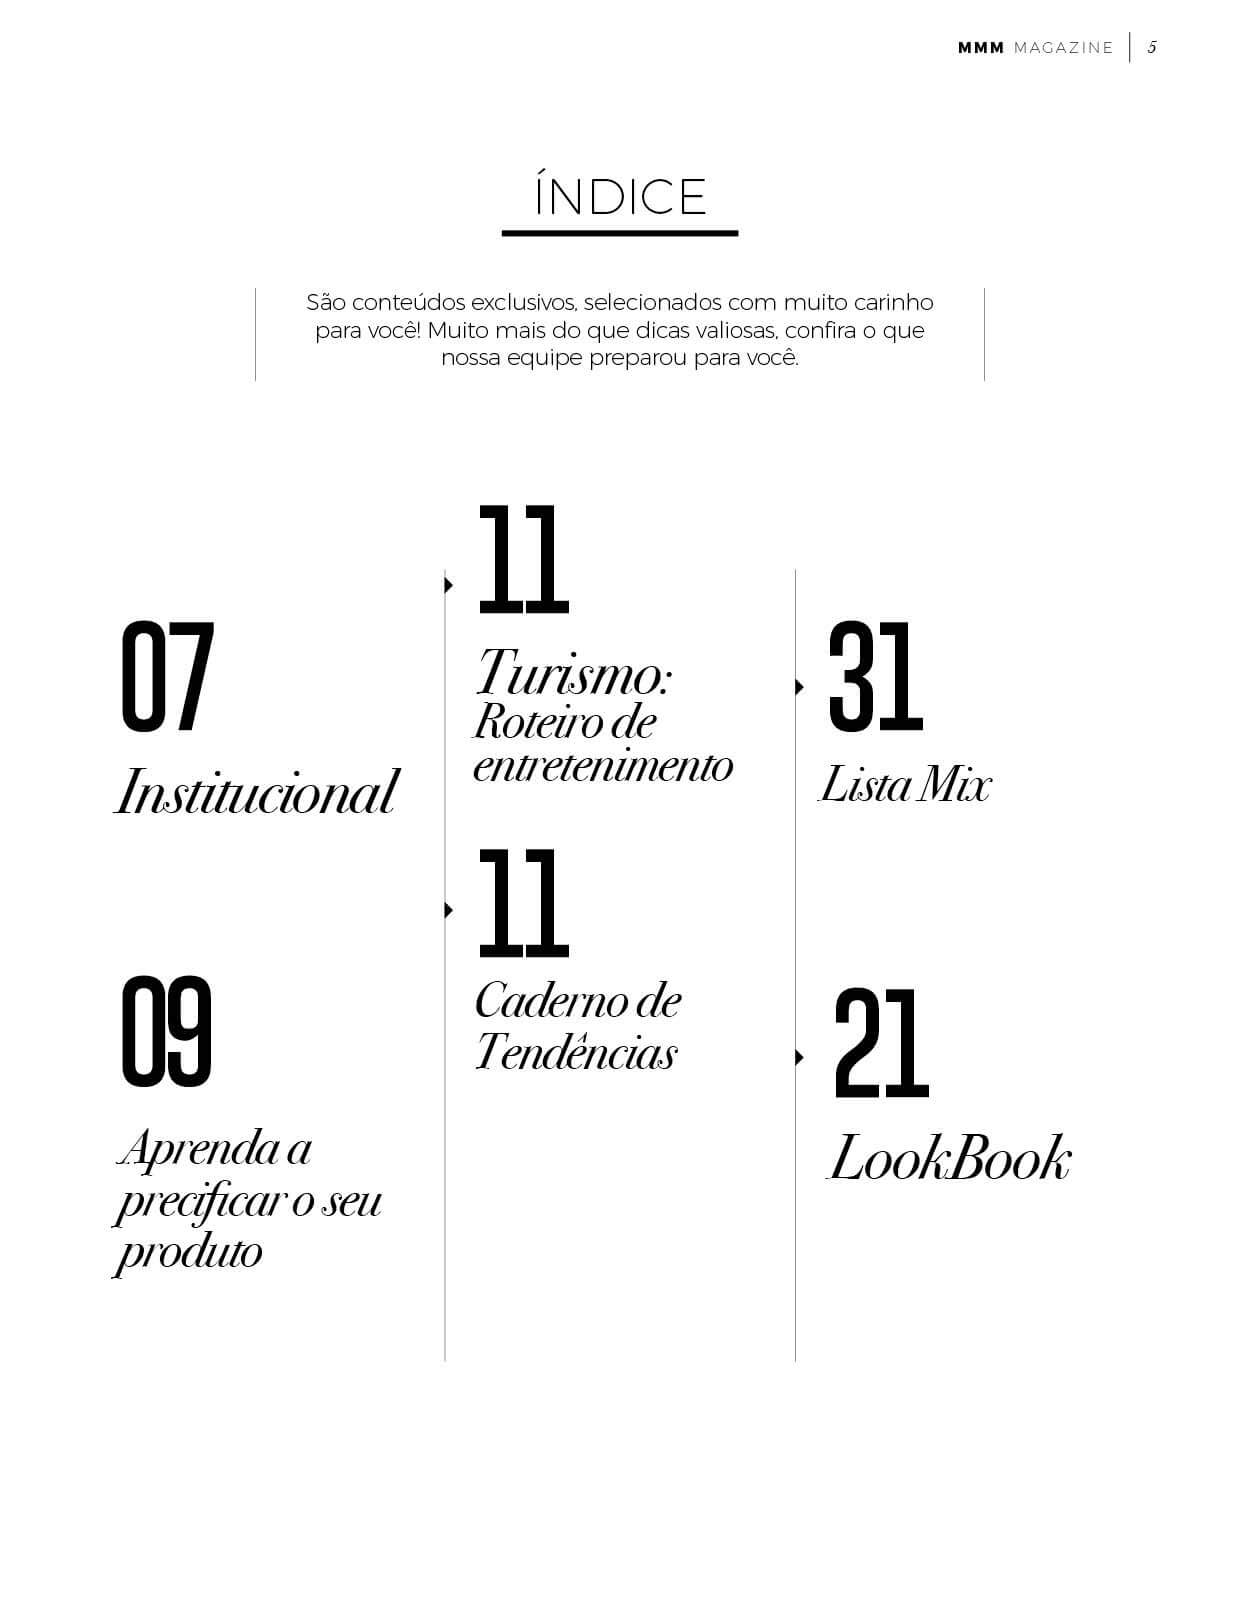 revista-mmmagazine-5